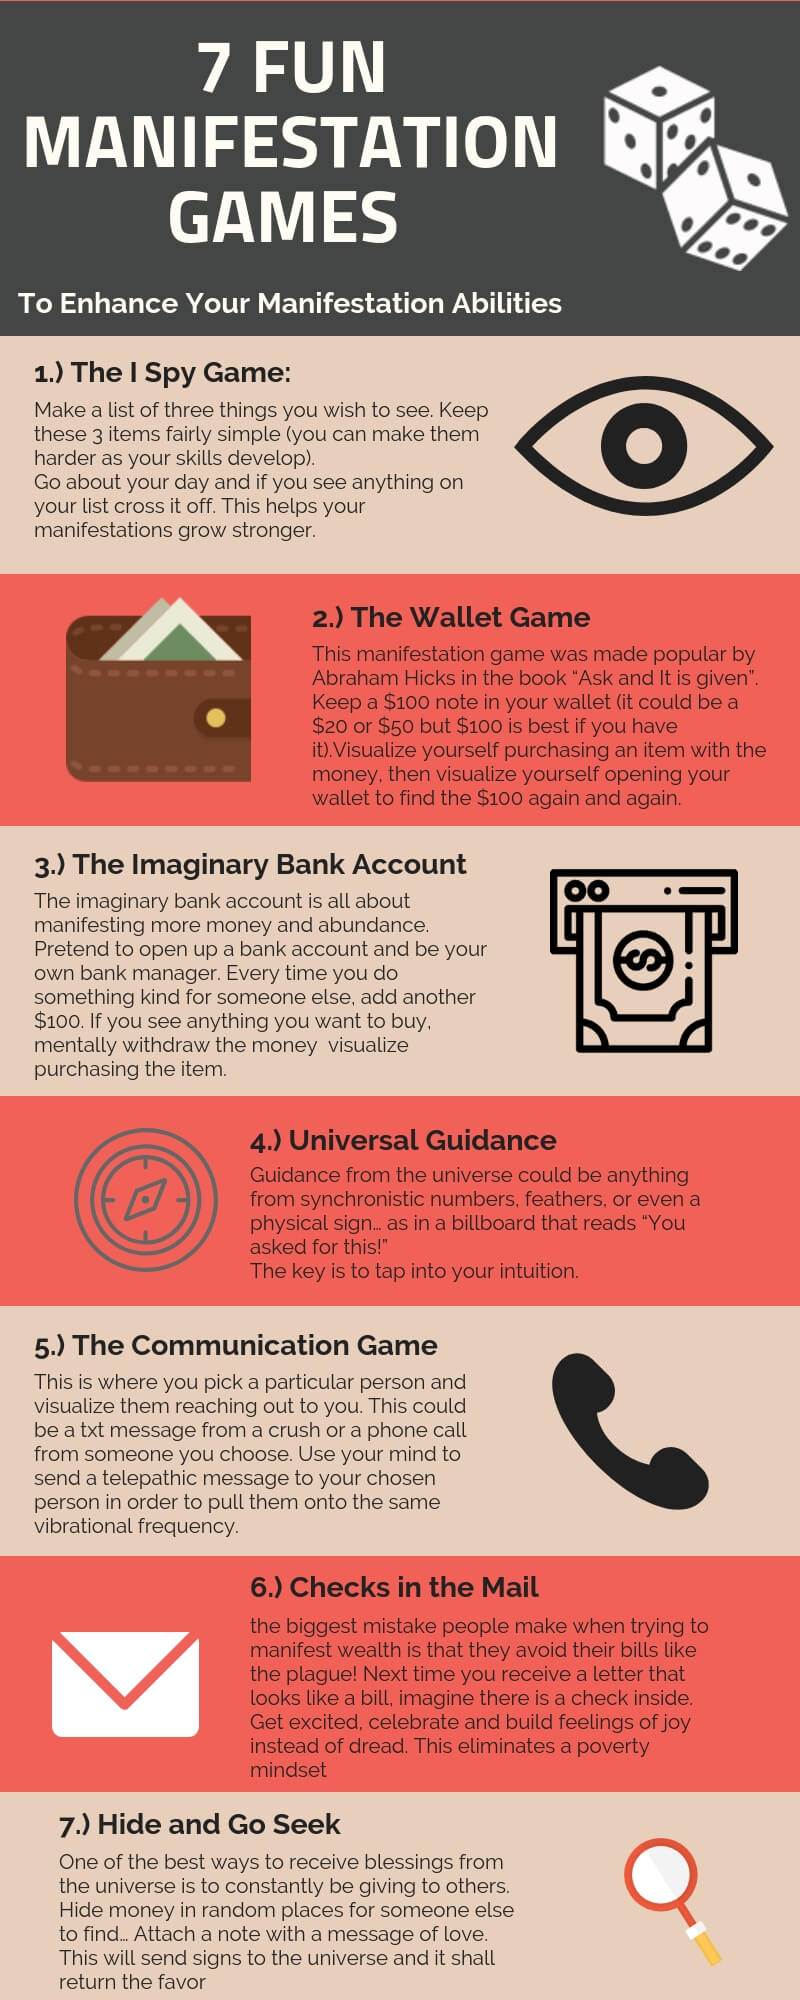 7 Fun Manifestation Games to Enhance Your Manifestation Abilities